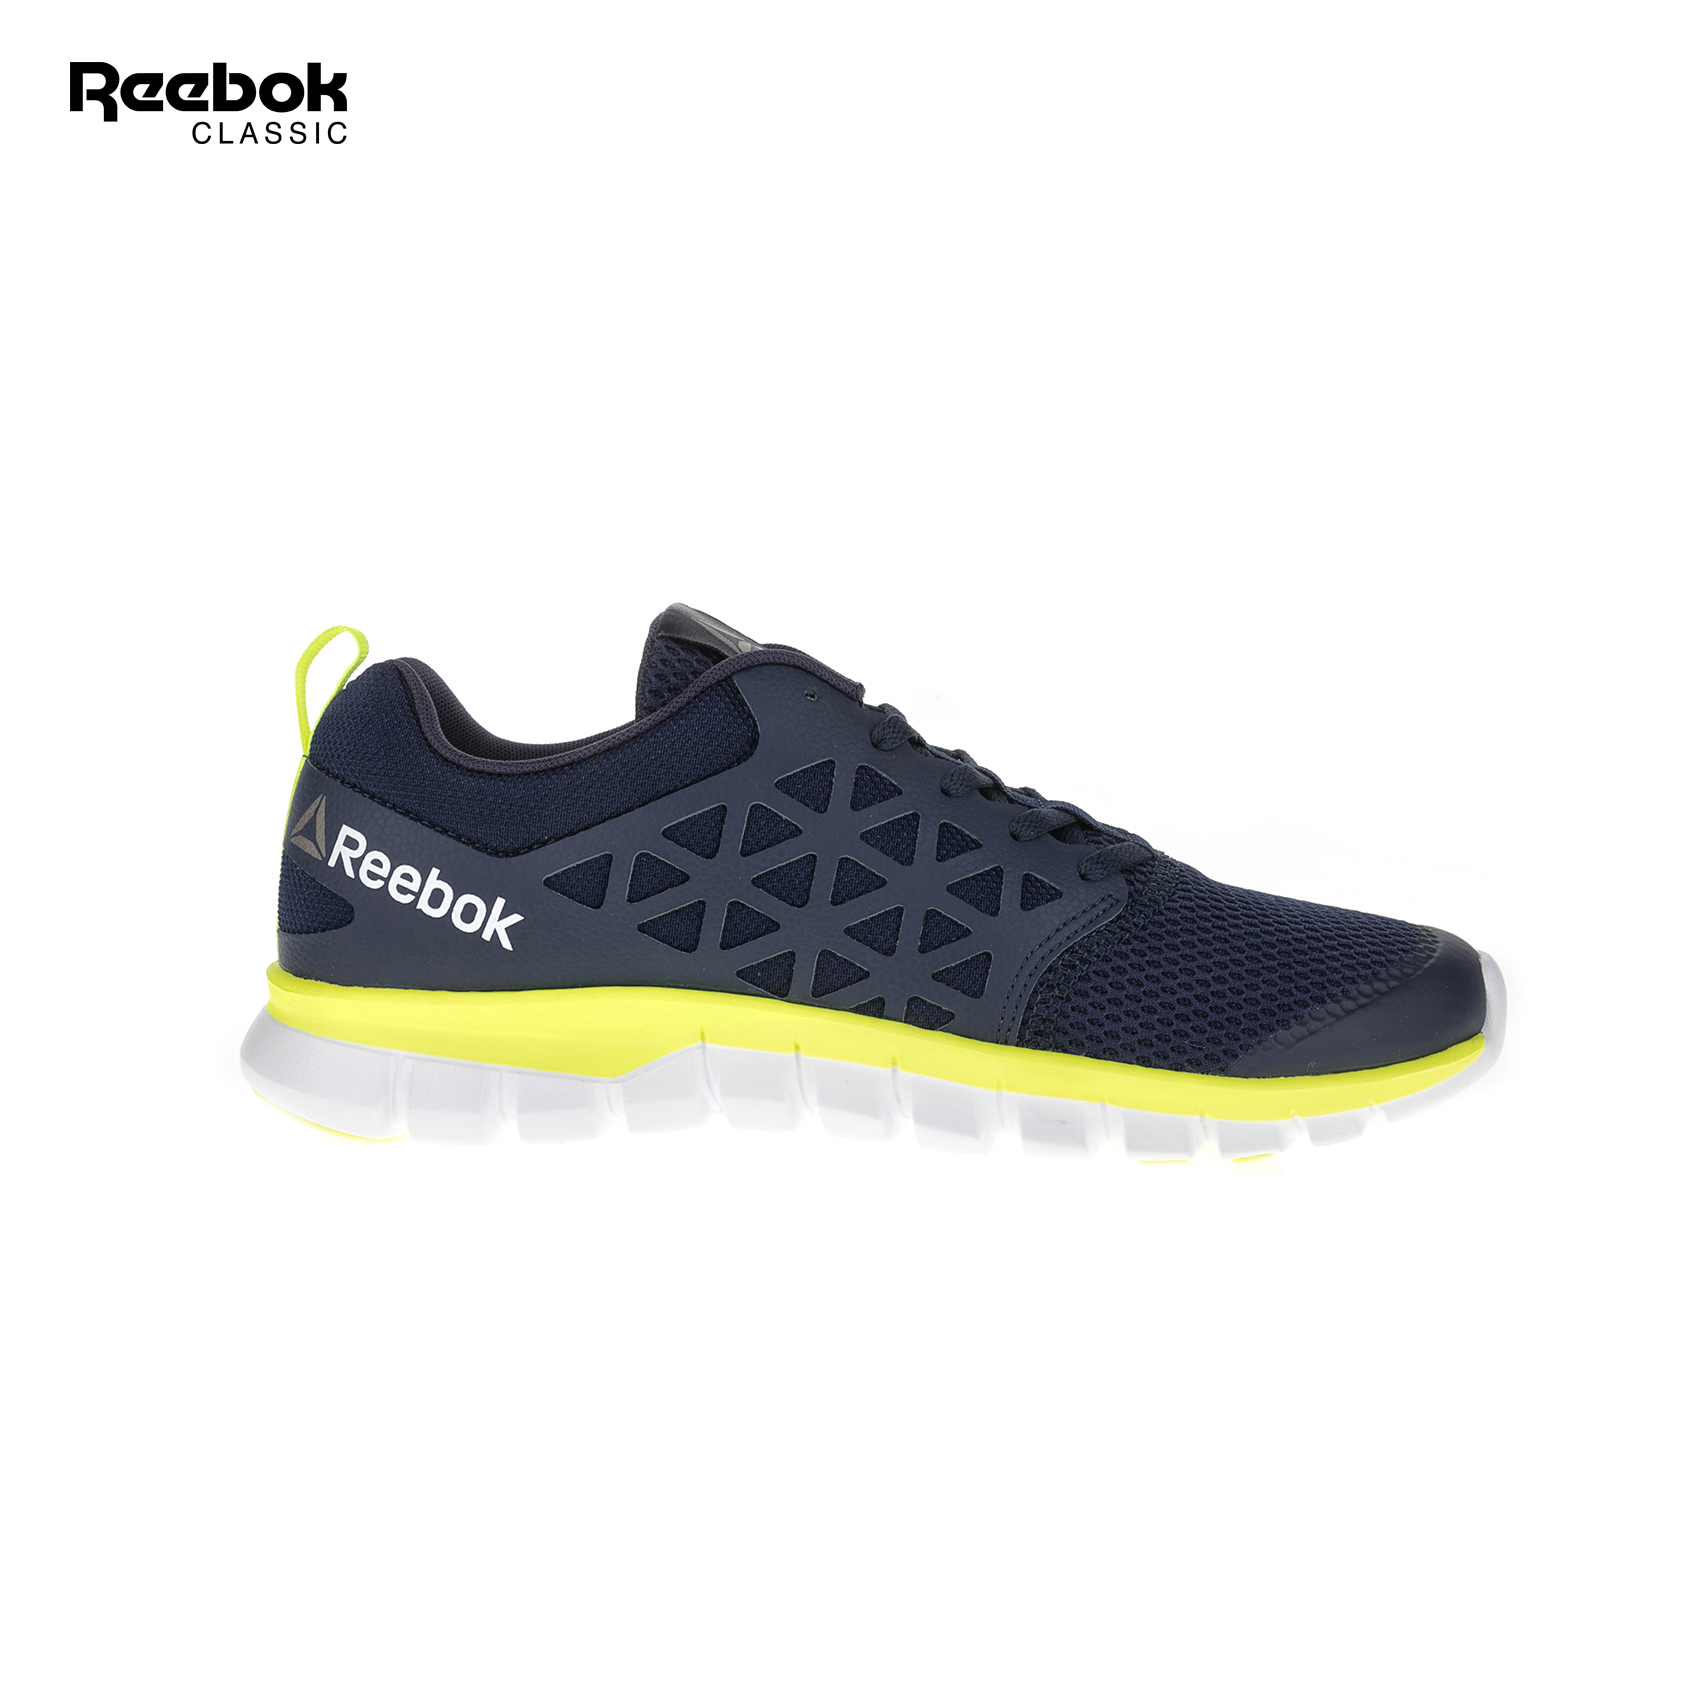 REEBOK CLASSIC – Ανδρικά παπούτσια REEBOK SUBLITE XT CUSHION 2.0 MT μπλε